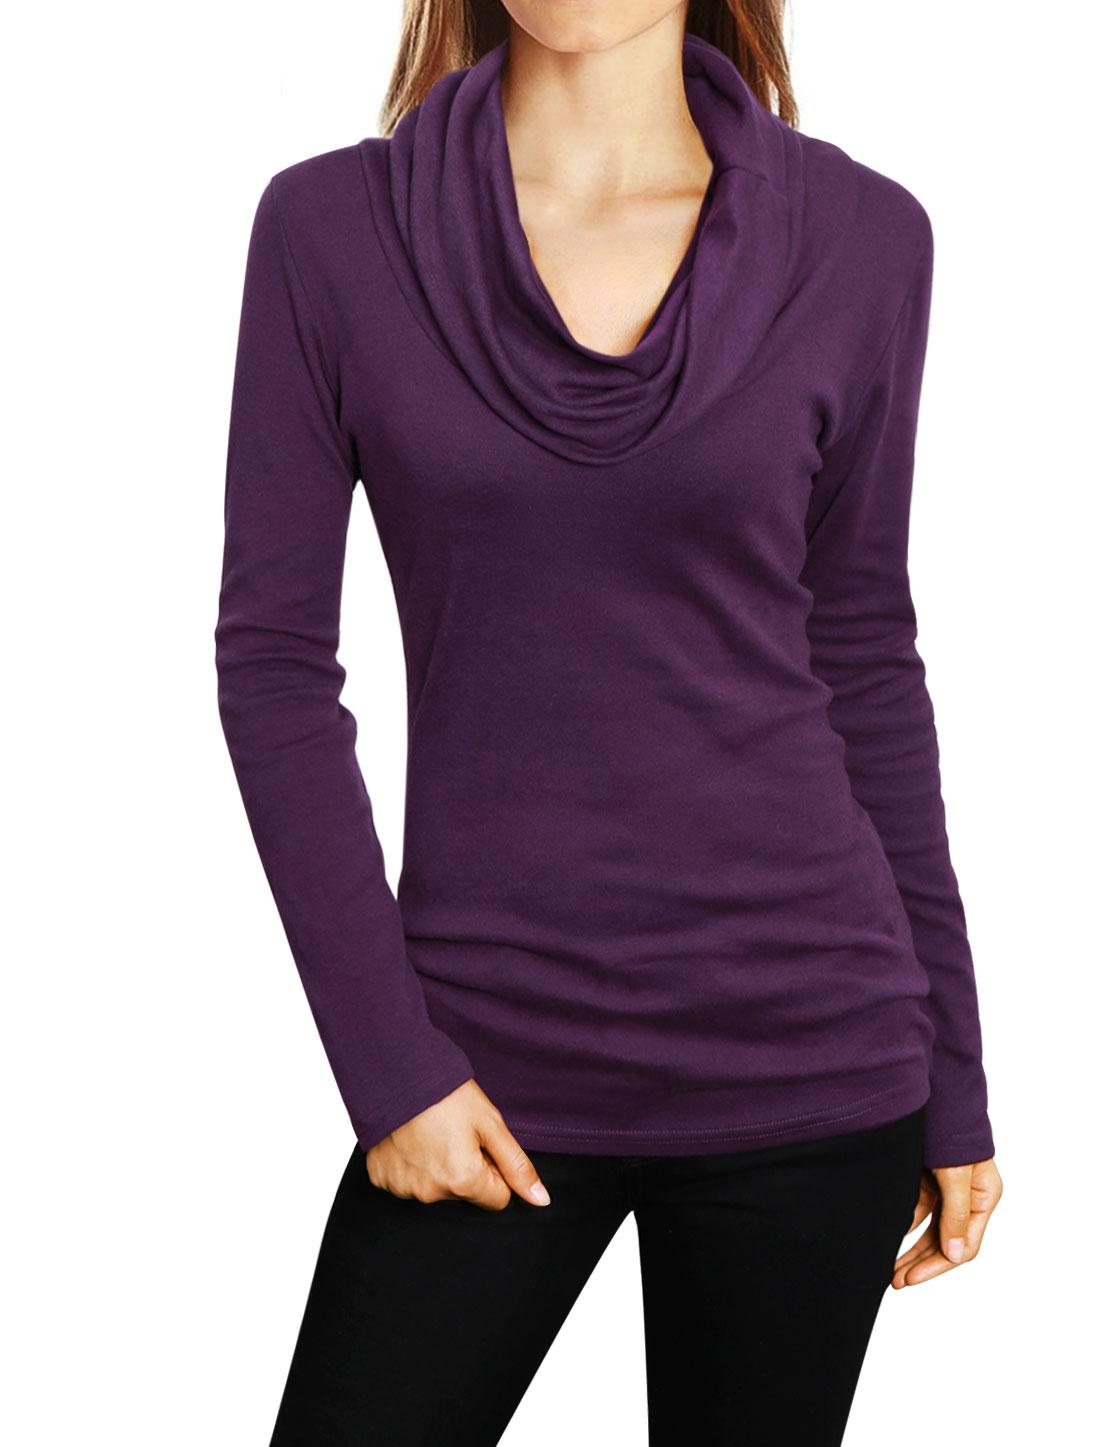 Woman Cowl Neck Long Sleeves Slim Cut Top Purple XL